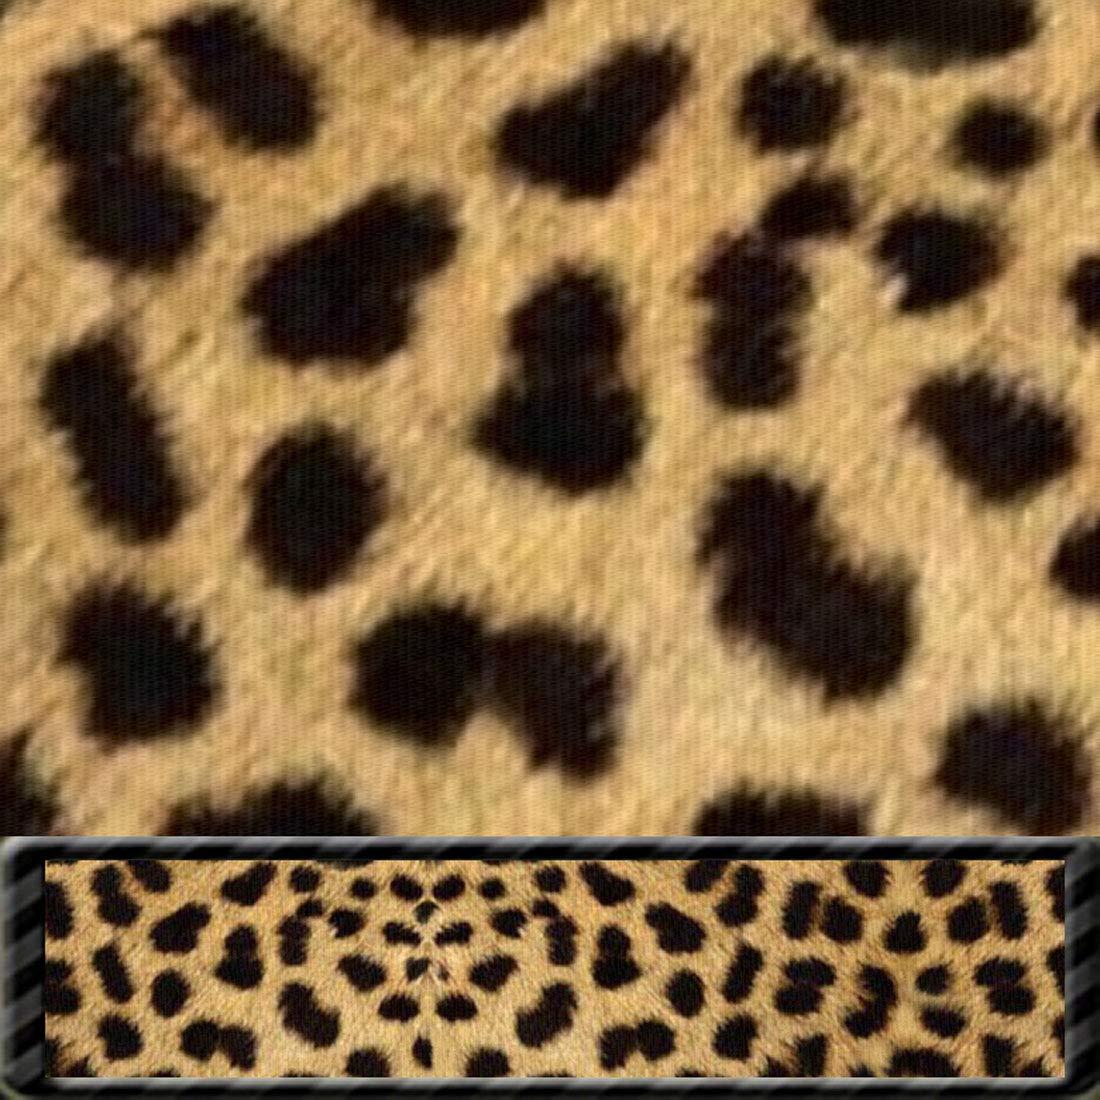 Moose Pet Wear Deluxe Dog Leash - Patterned Heavy Duty Pet Leashes, Made in the USA – 3/4 Inch x 6 Feet, Leopard